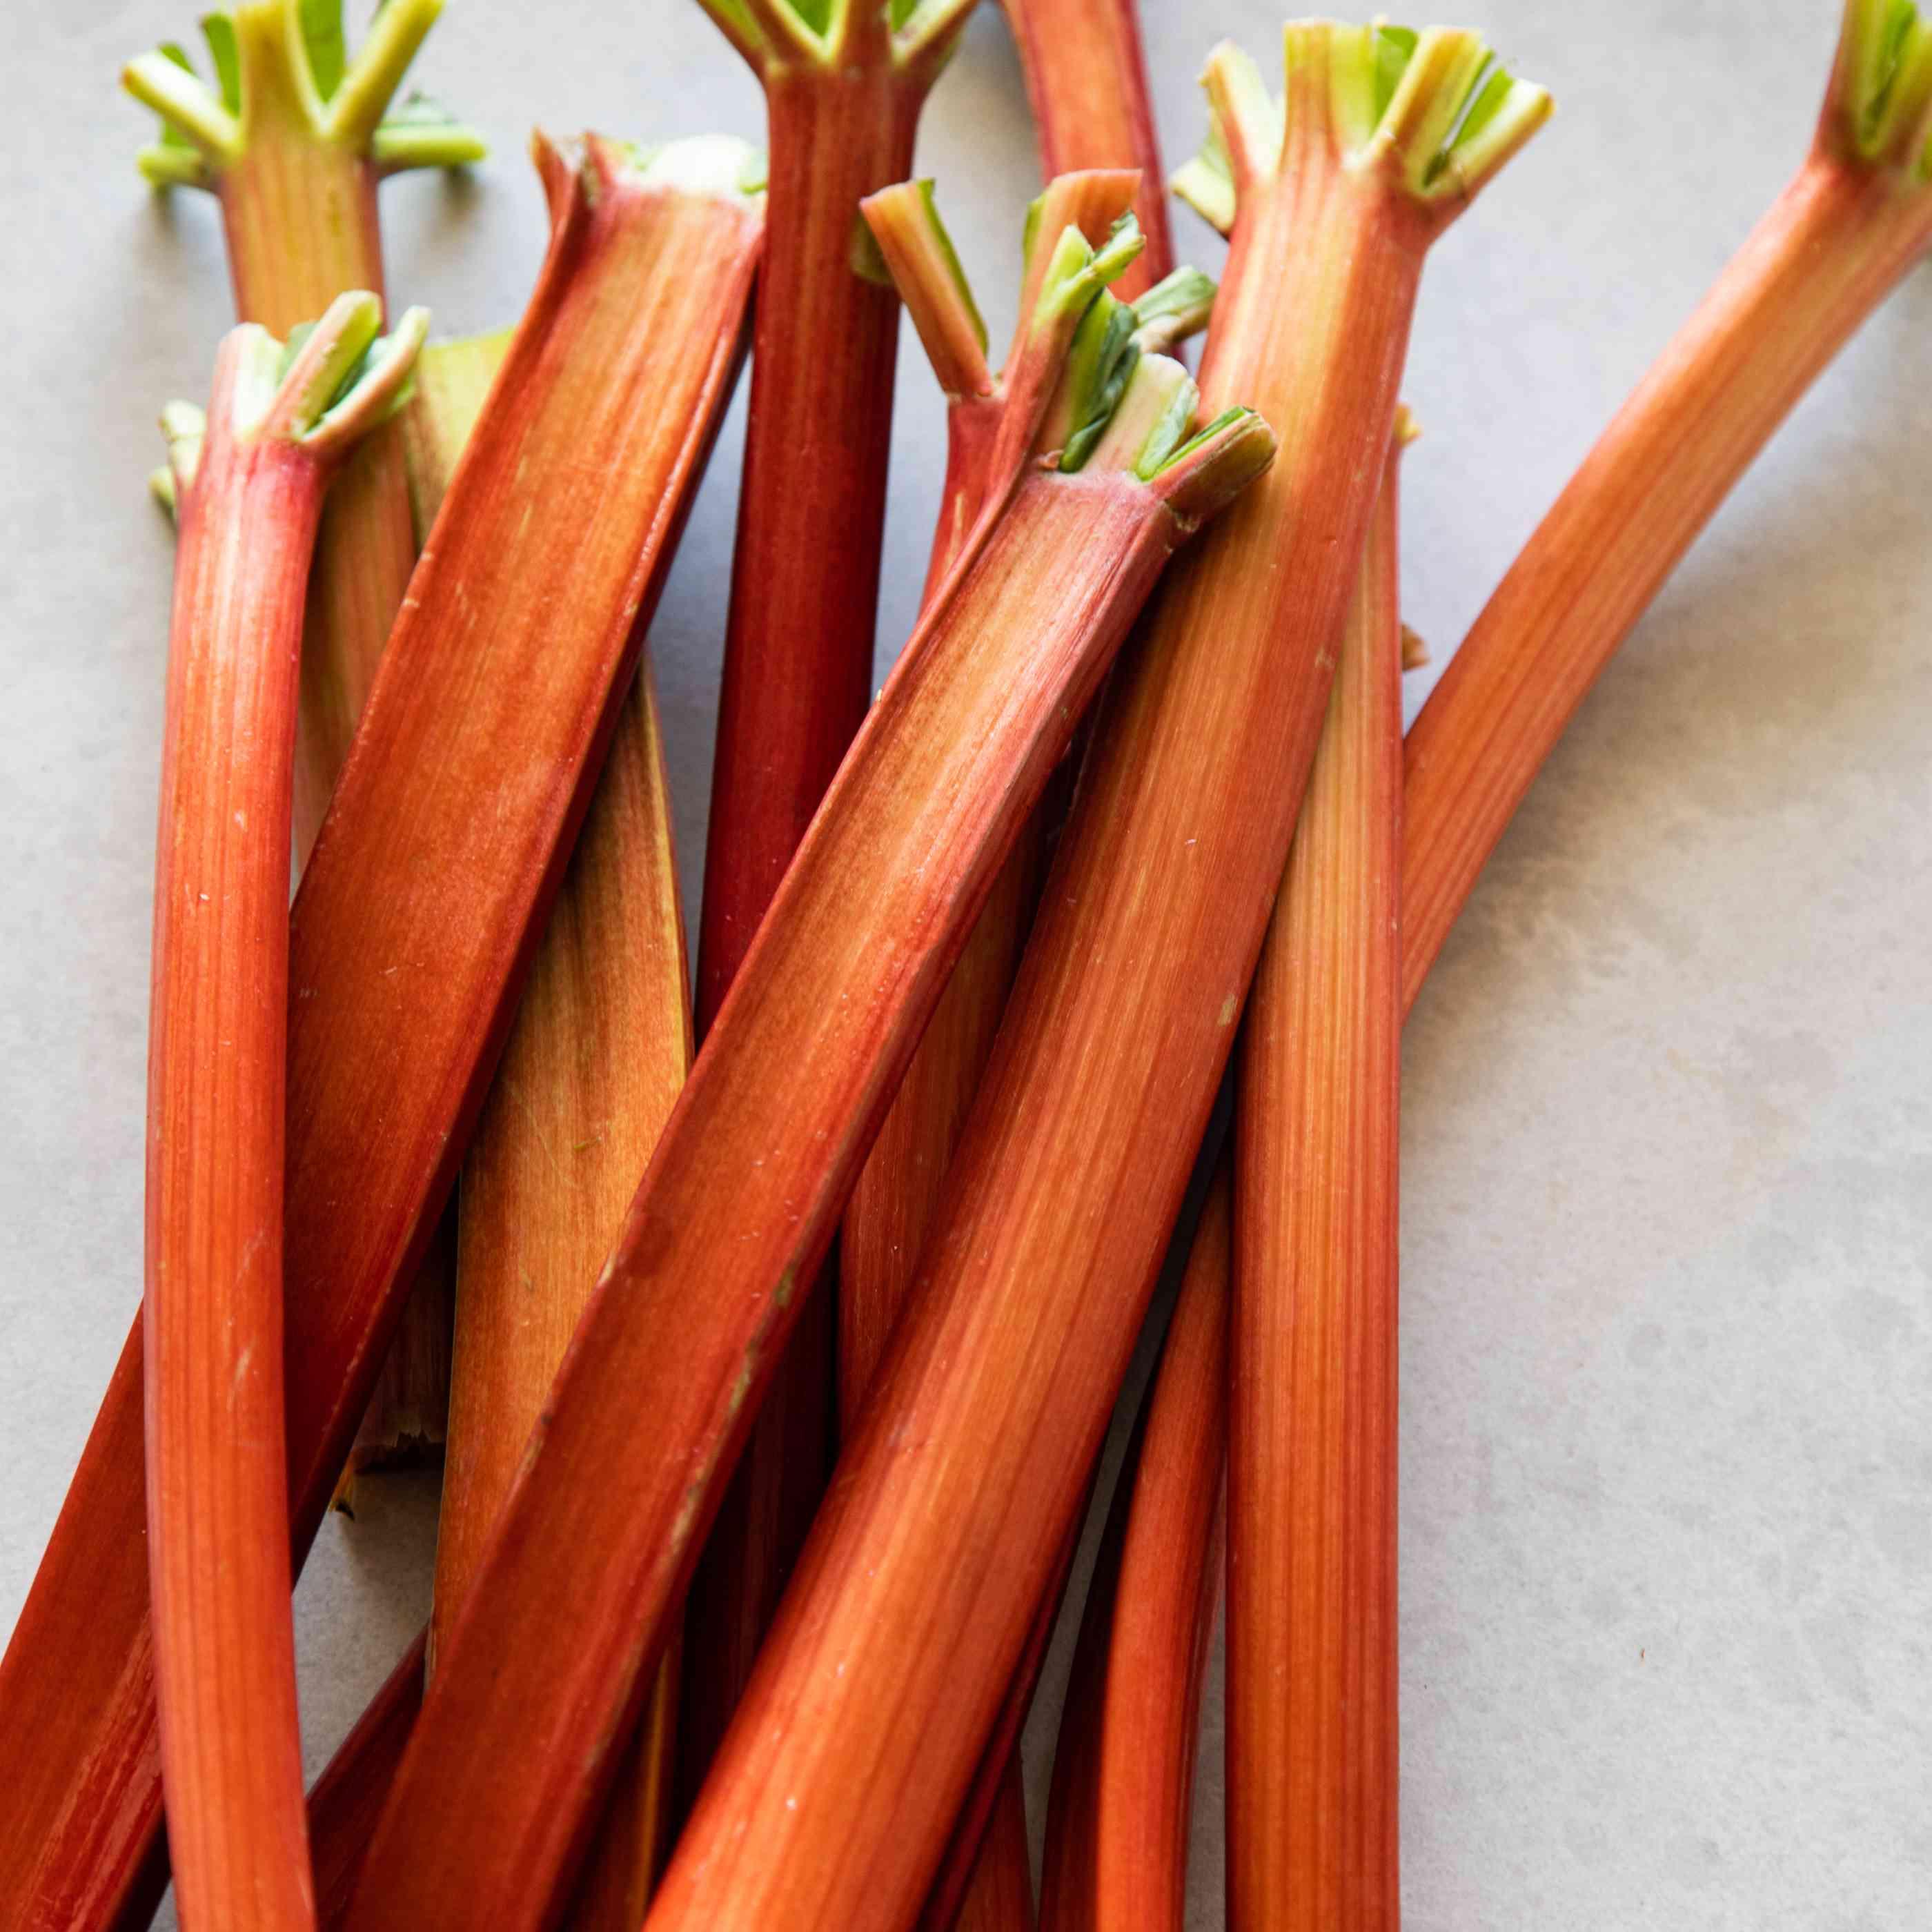 Red green rhubarb stalks